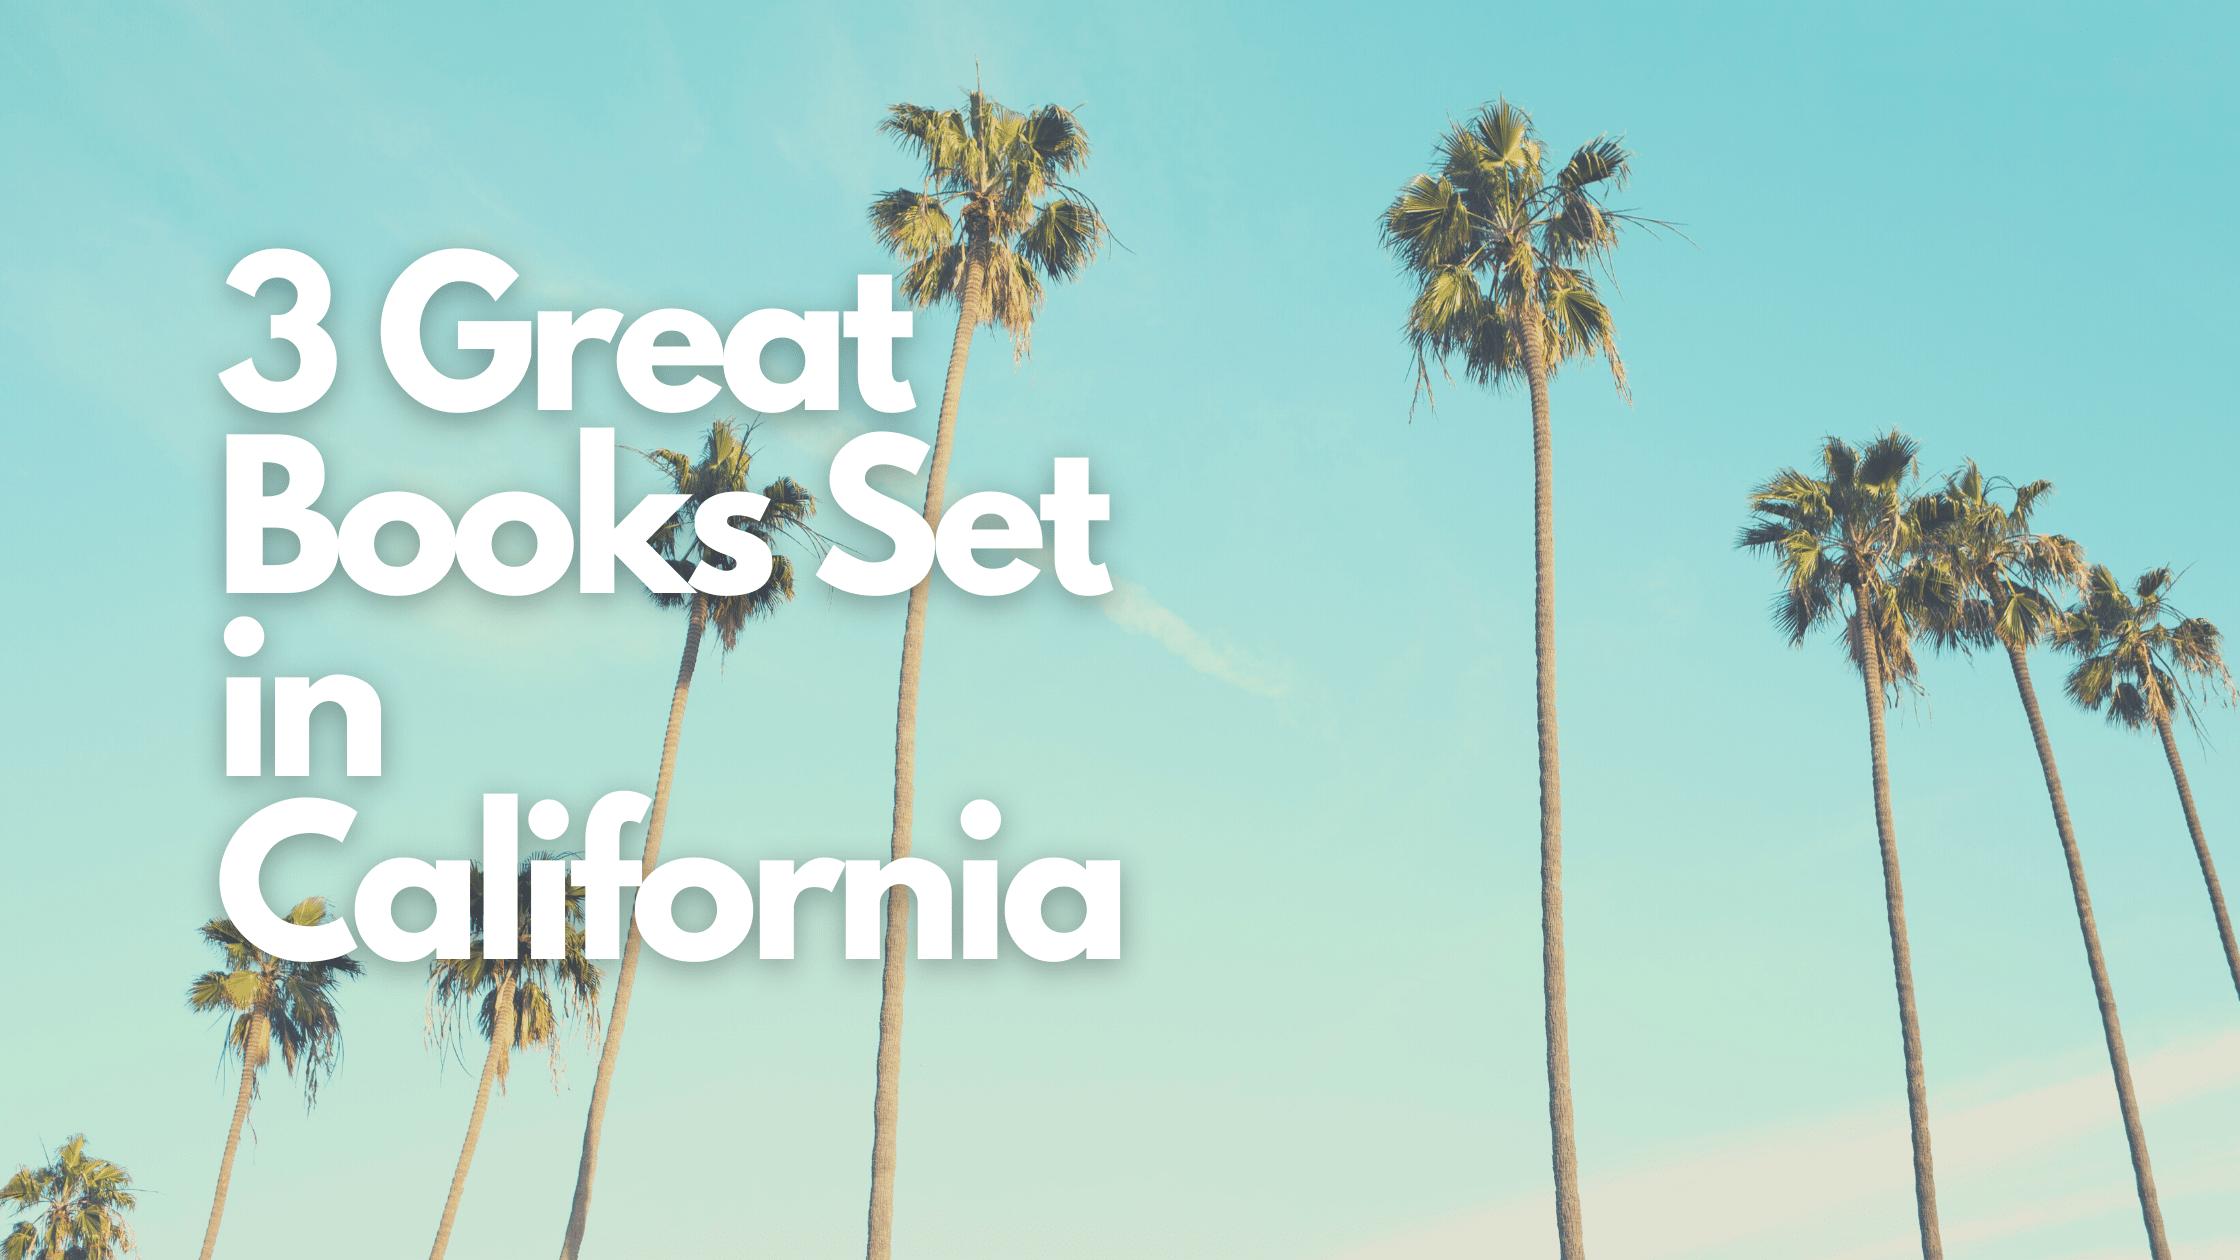 3 Great Books Set in California